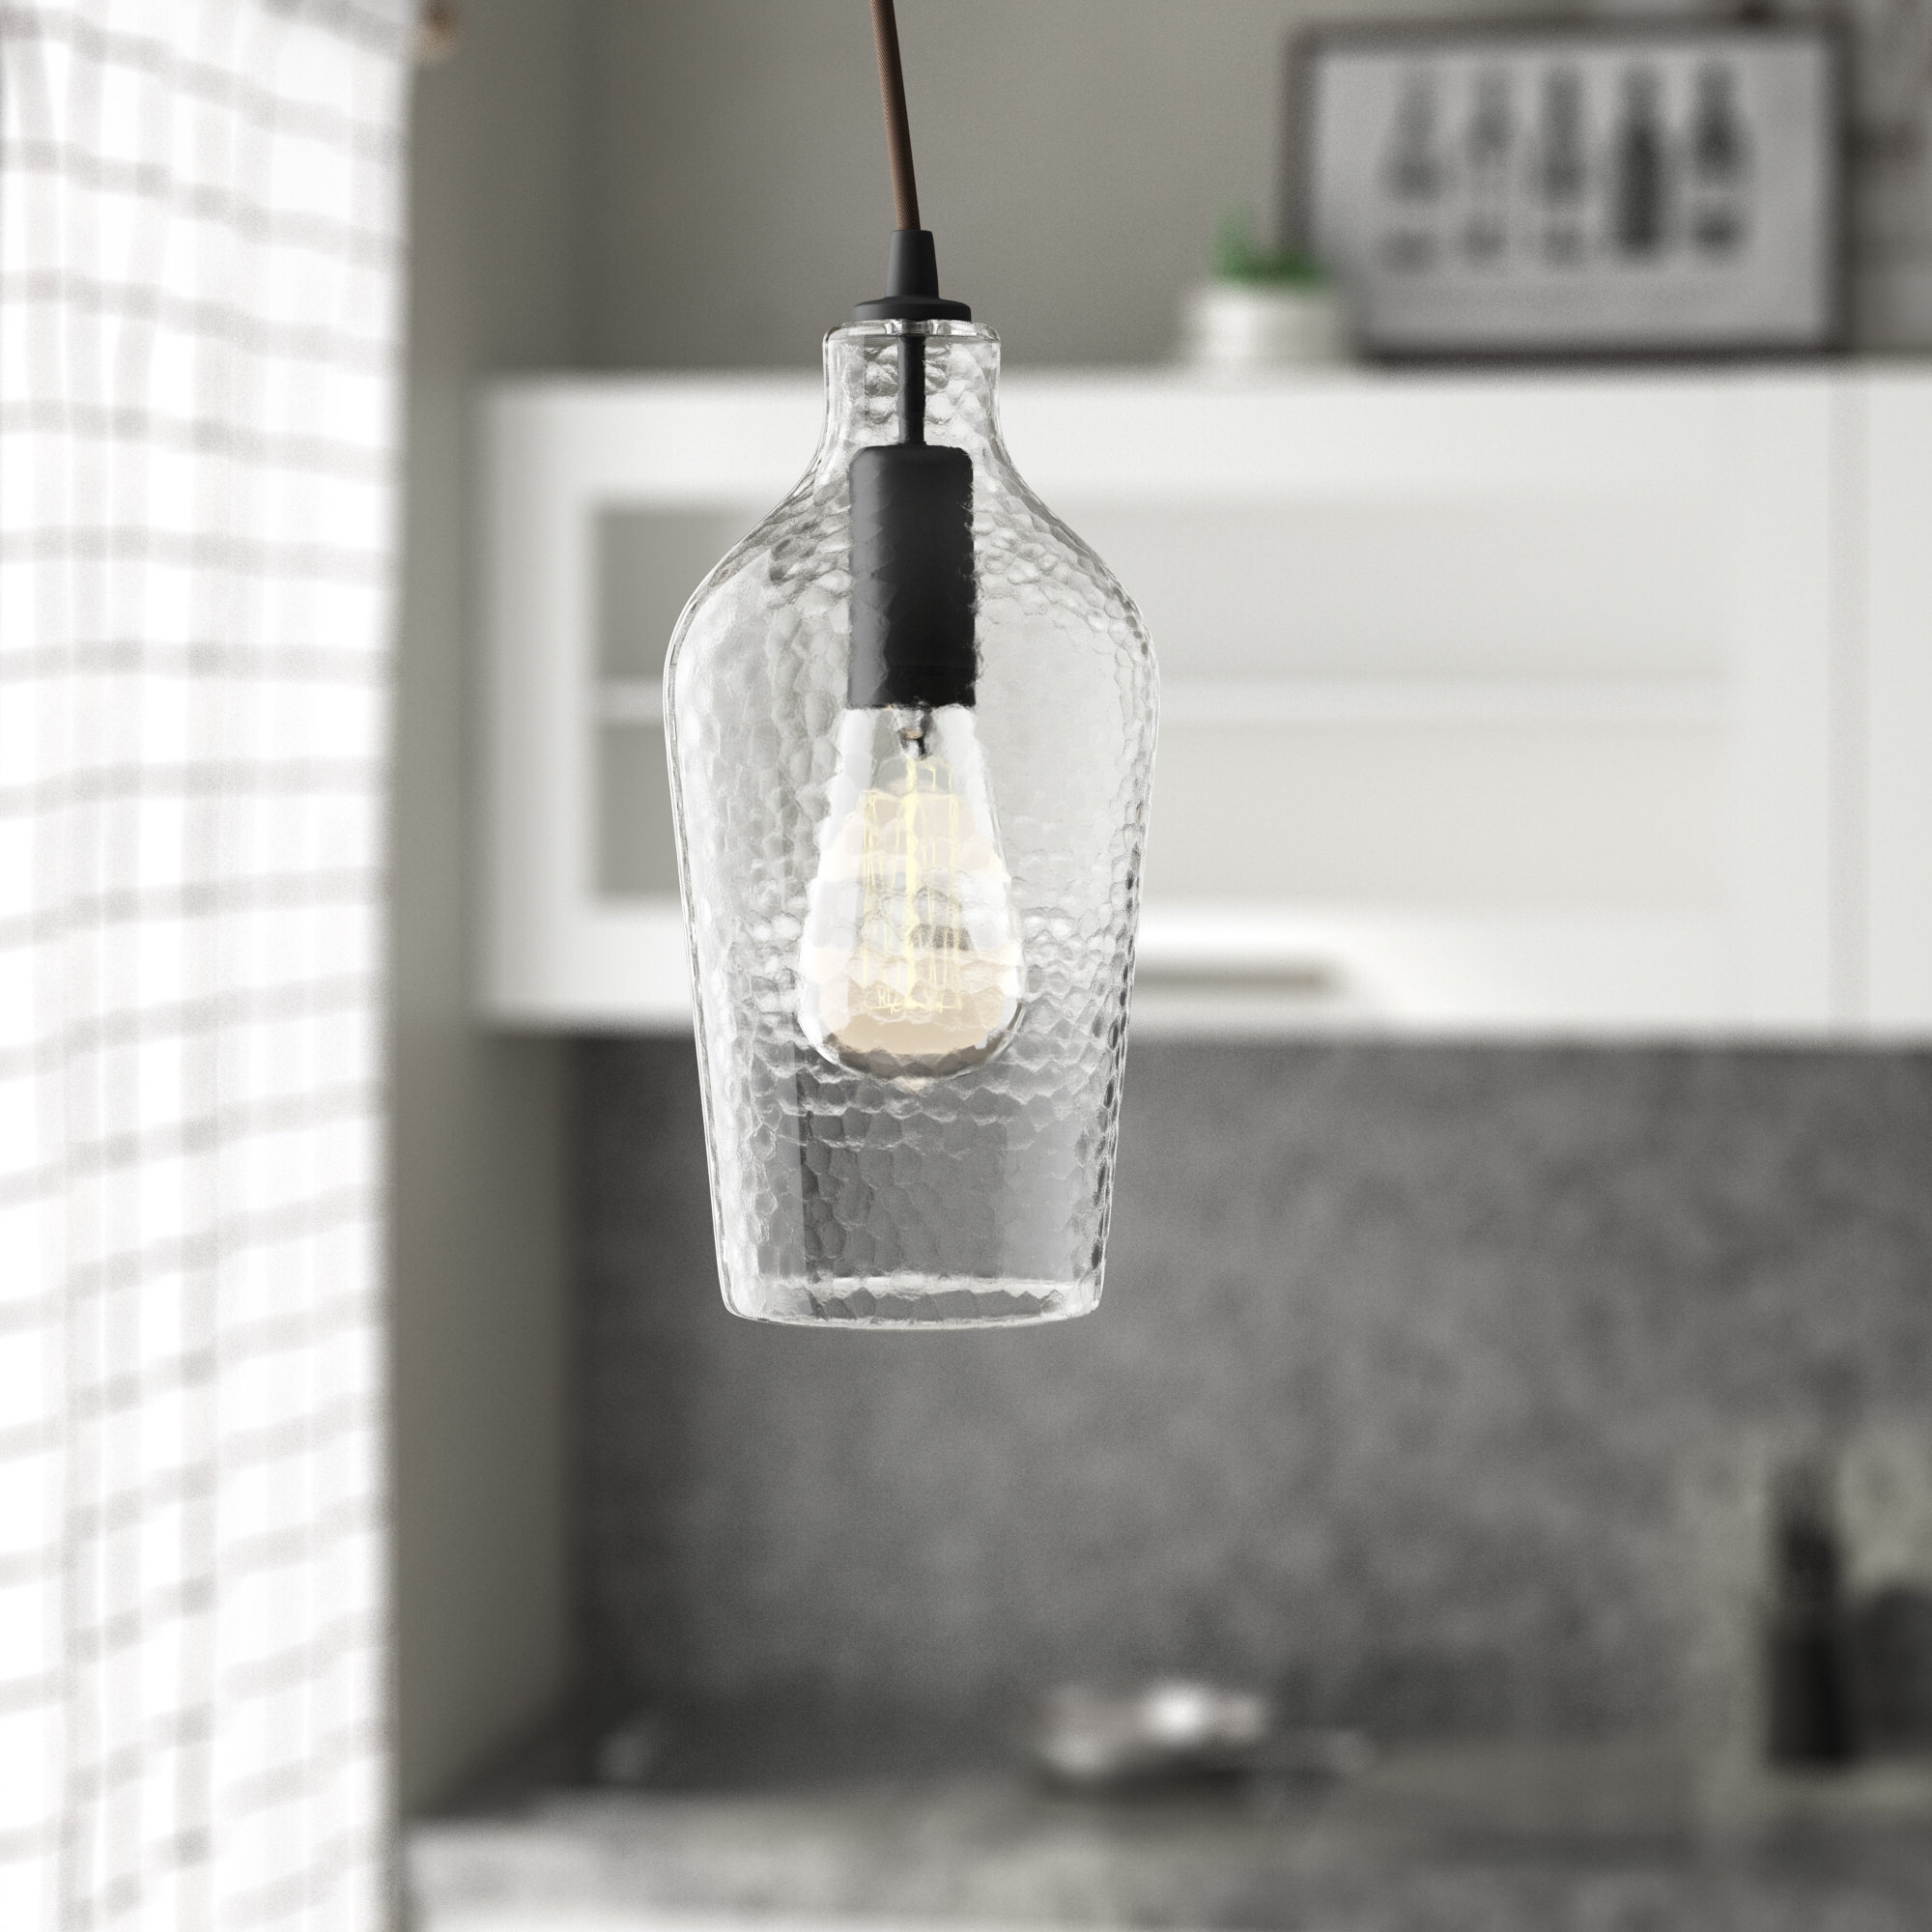 Erico 1 Light Single Bell Pendants With Most Popular 1 Light Single Jar Pendant (View 21 of 25)